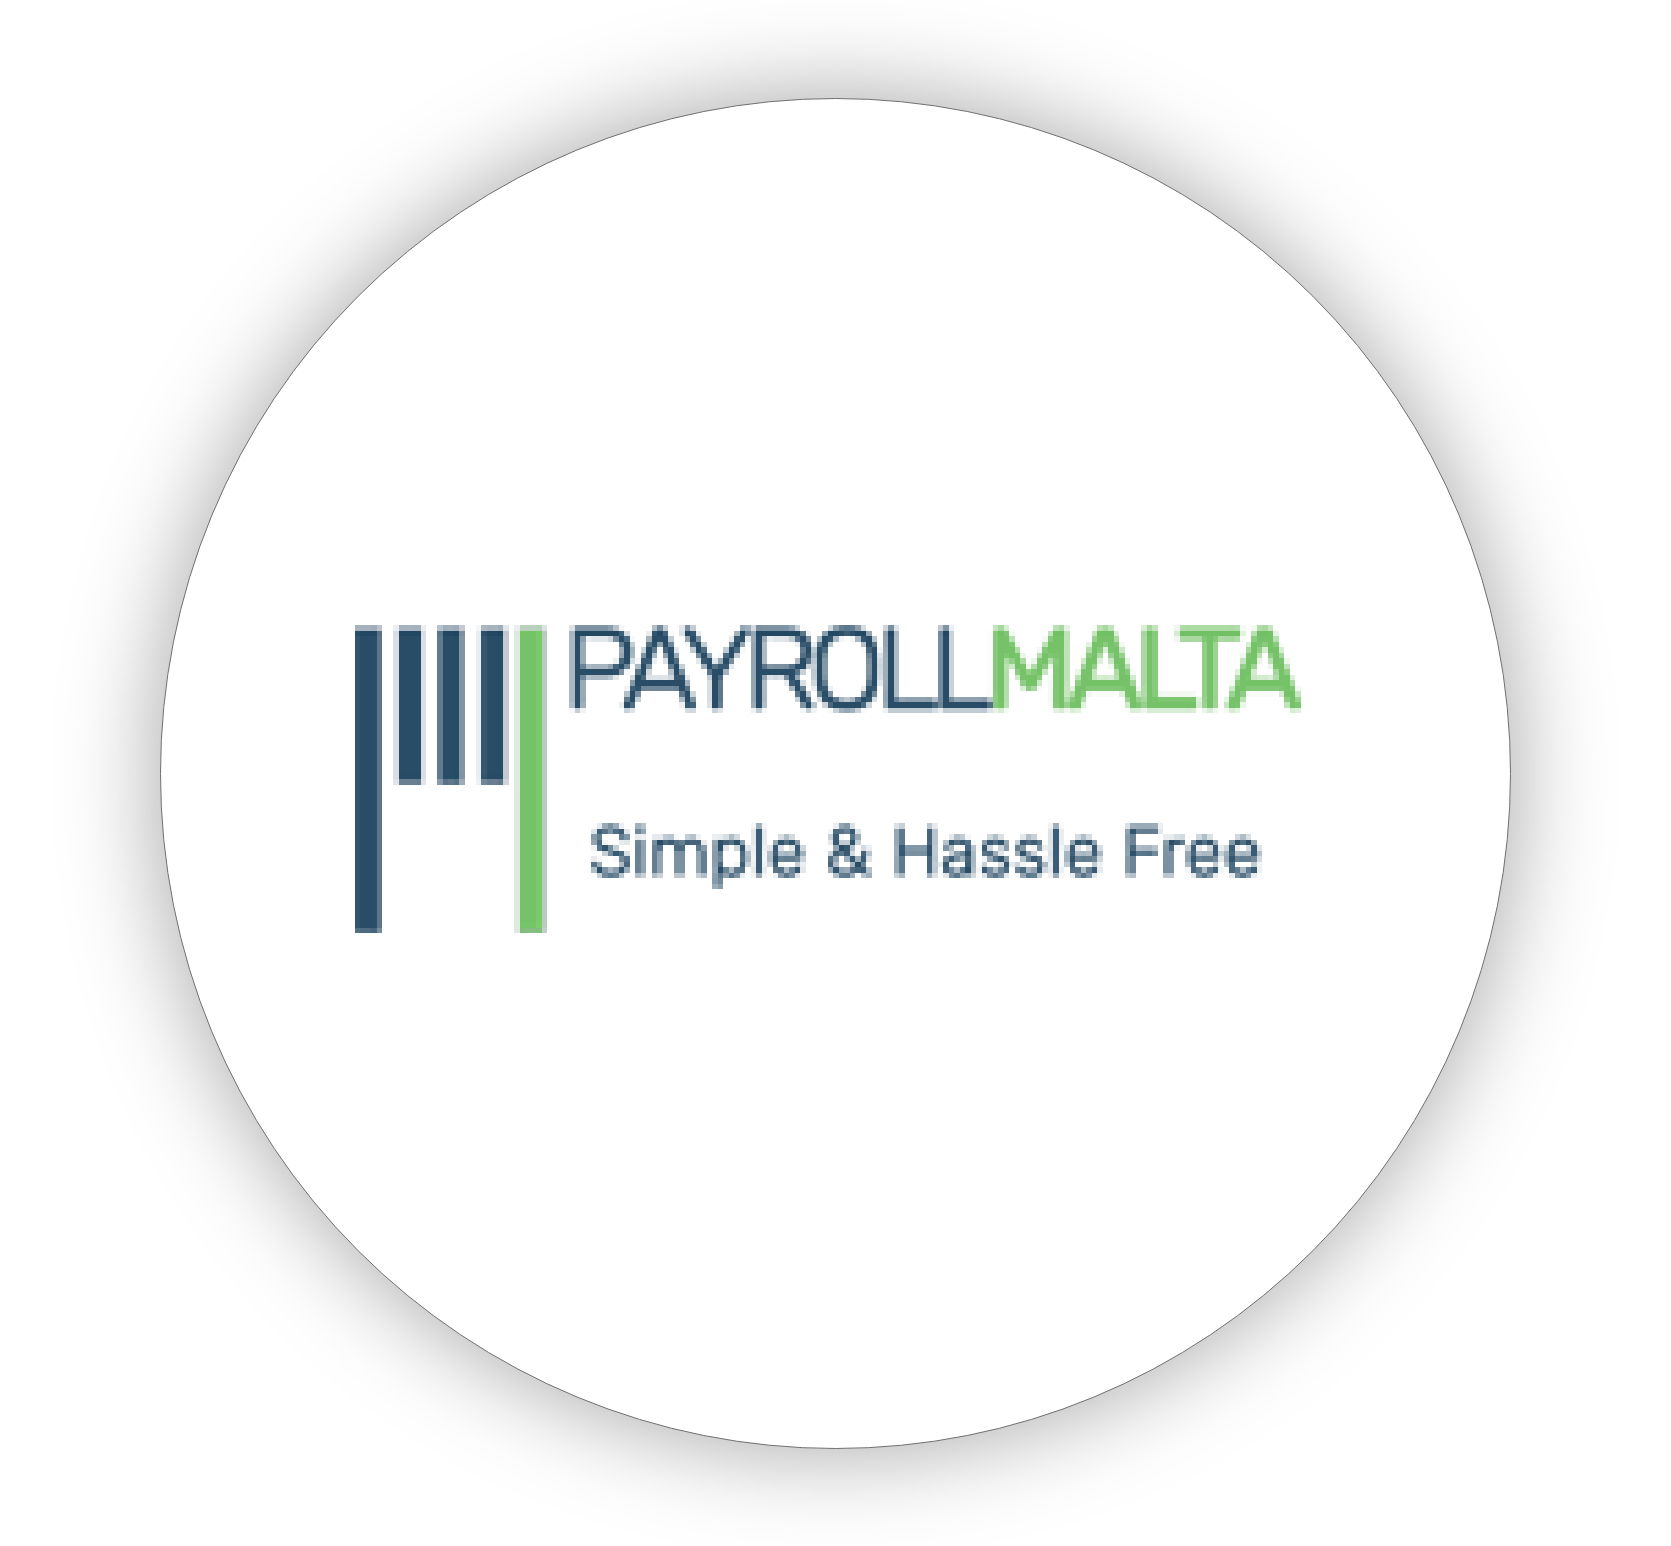 PayrollMalta